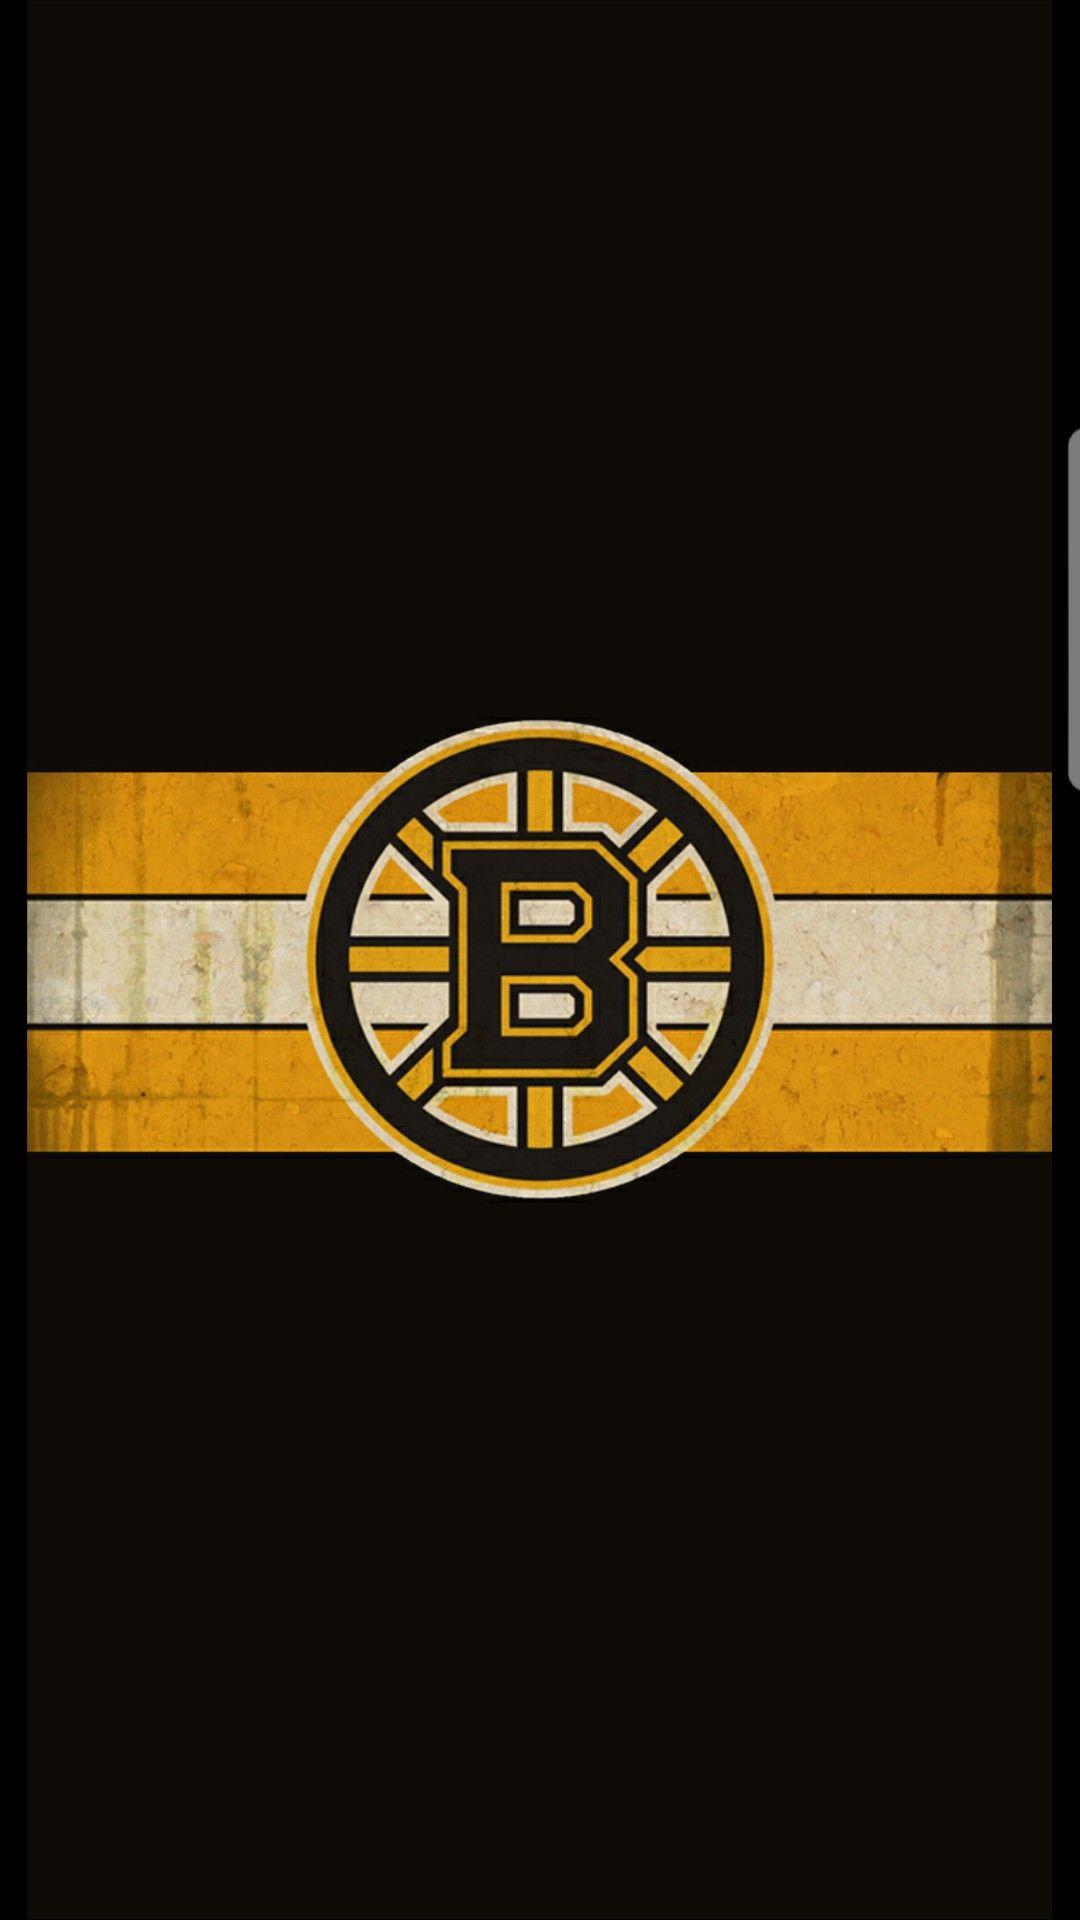 Pin By Archie Douglas On Sportz Wallpaperz Boston Bruins Wallpaper Iphone 5s Wallpaper Boston Bruins Hockey